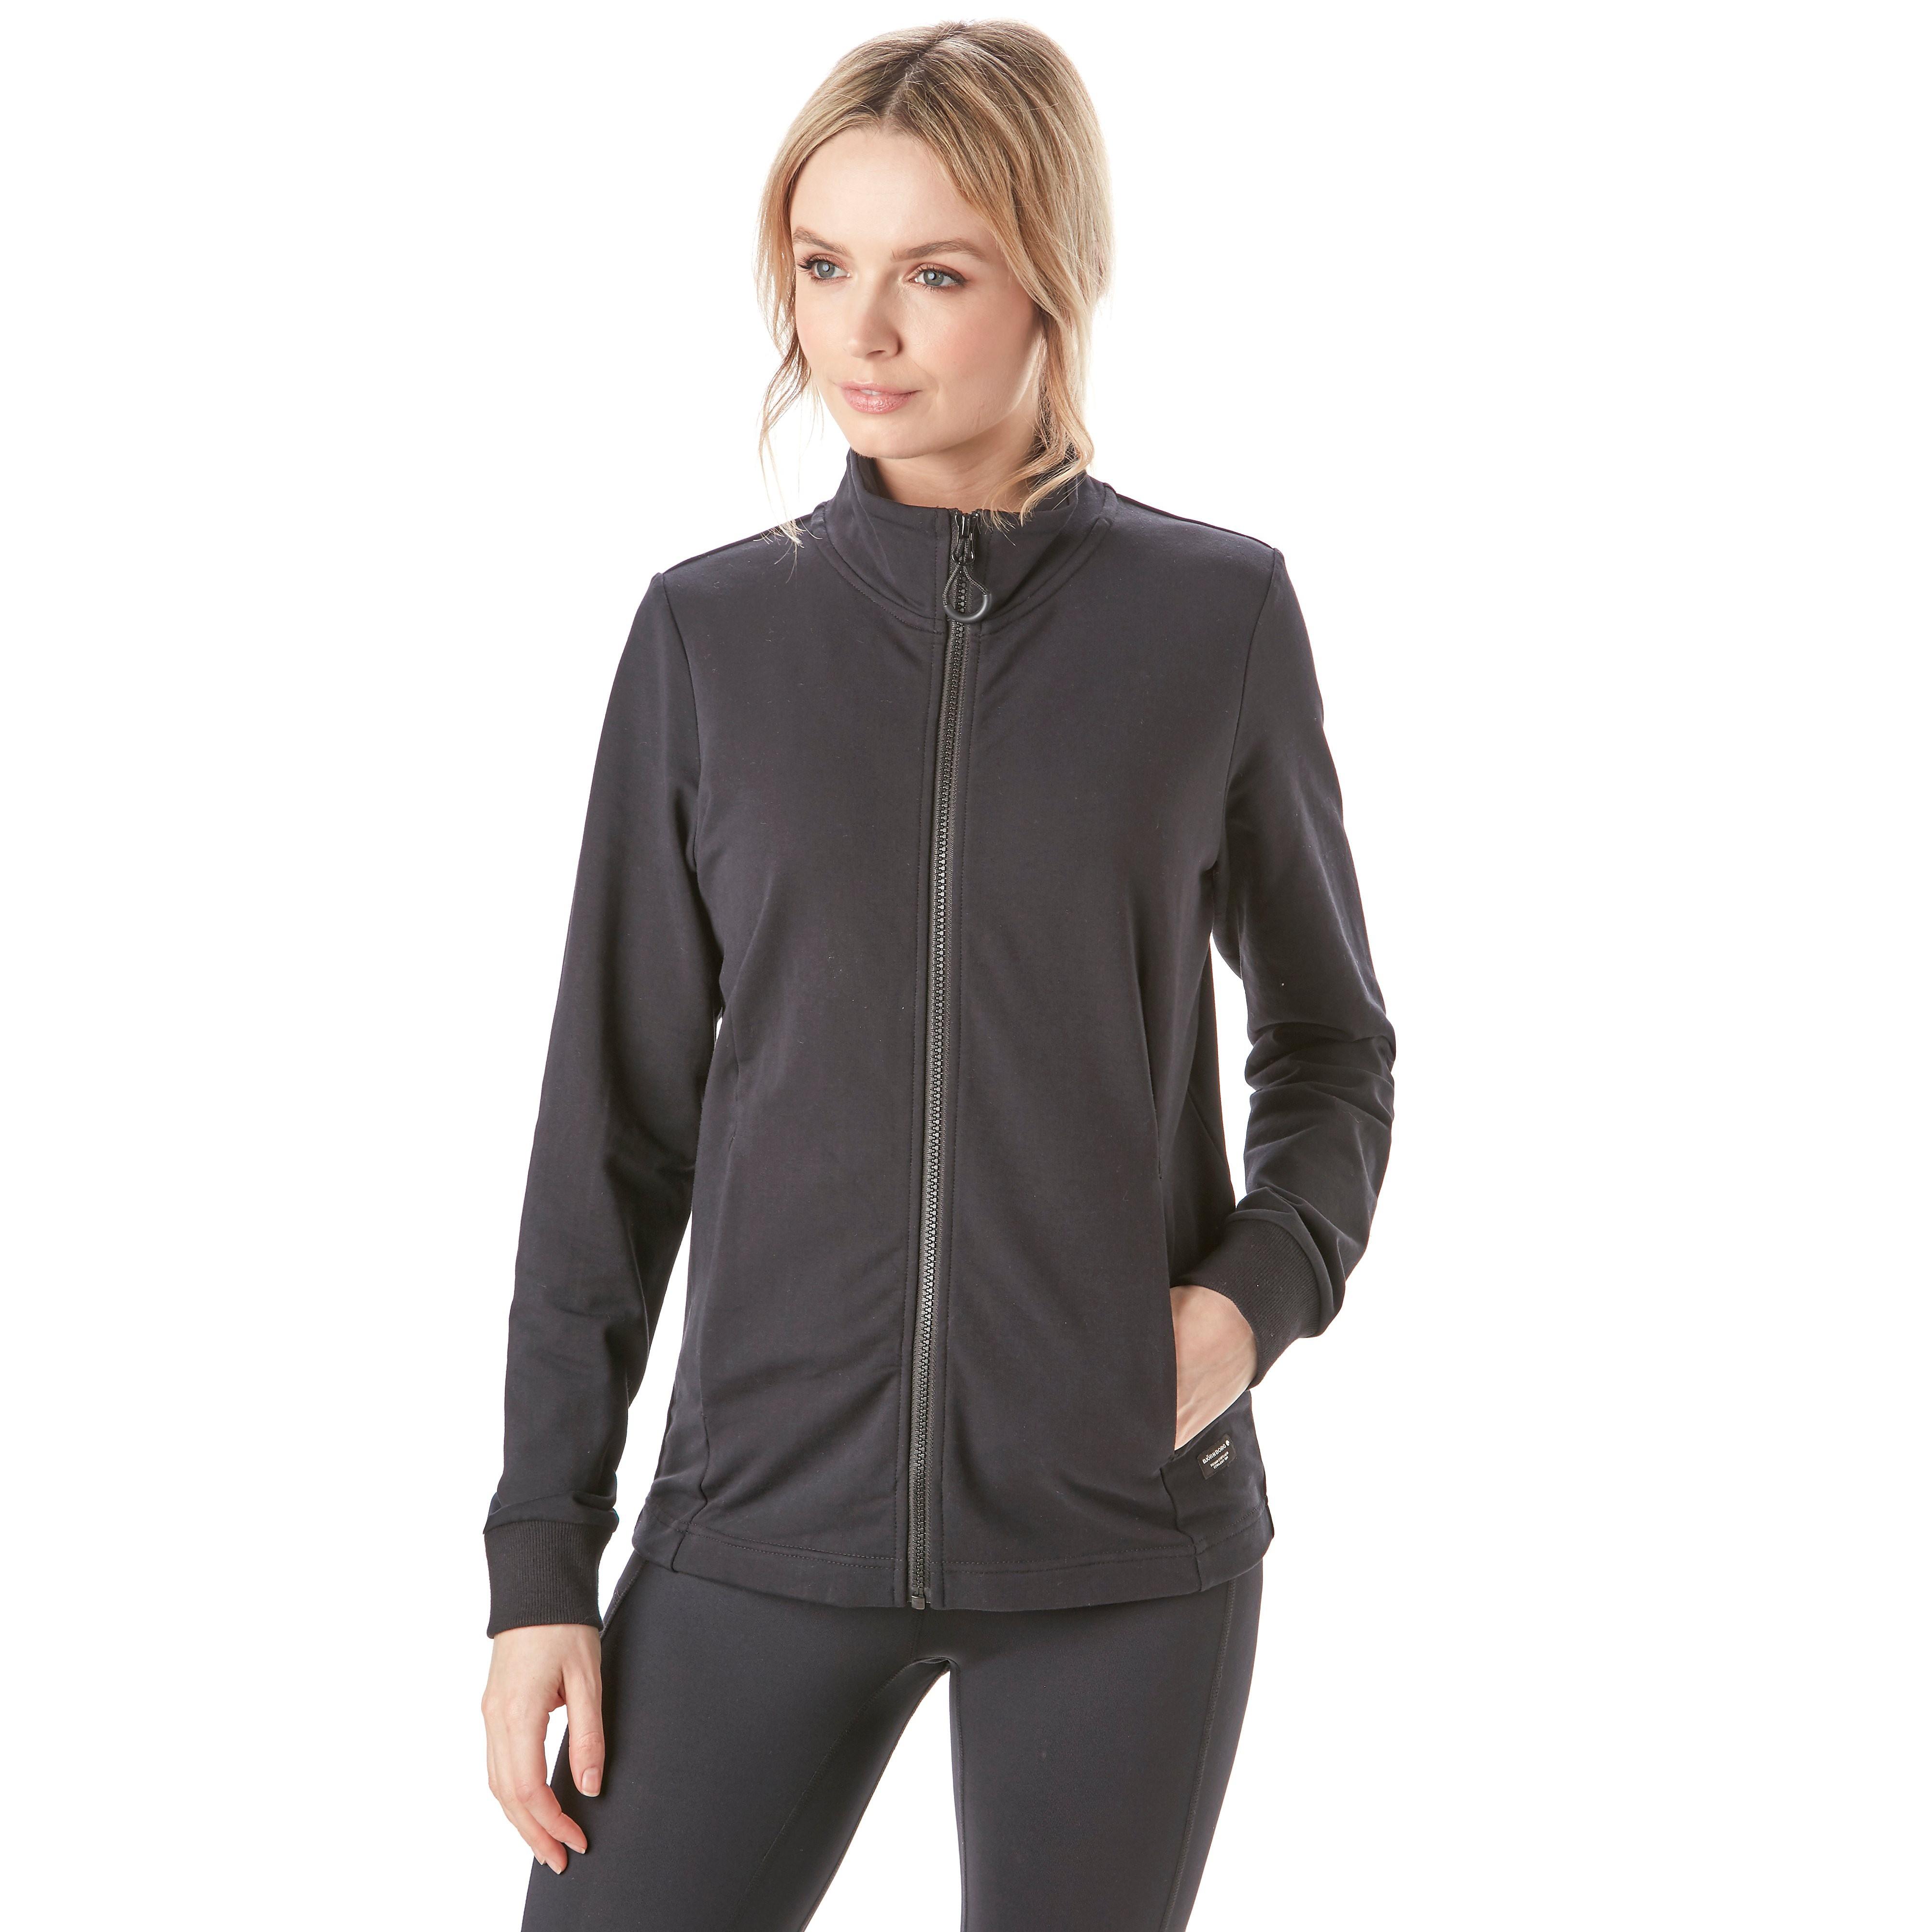 Bjorn Borg Dayna Women's Training Jacket